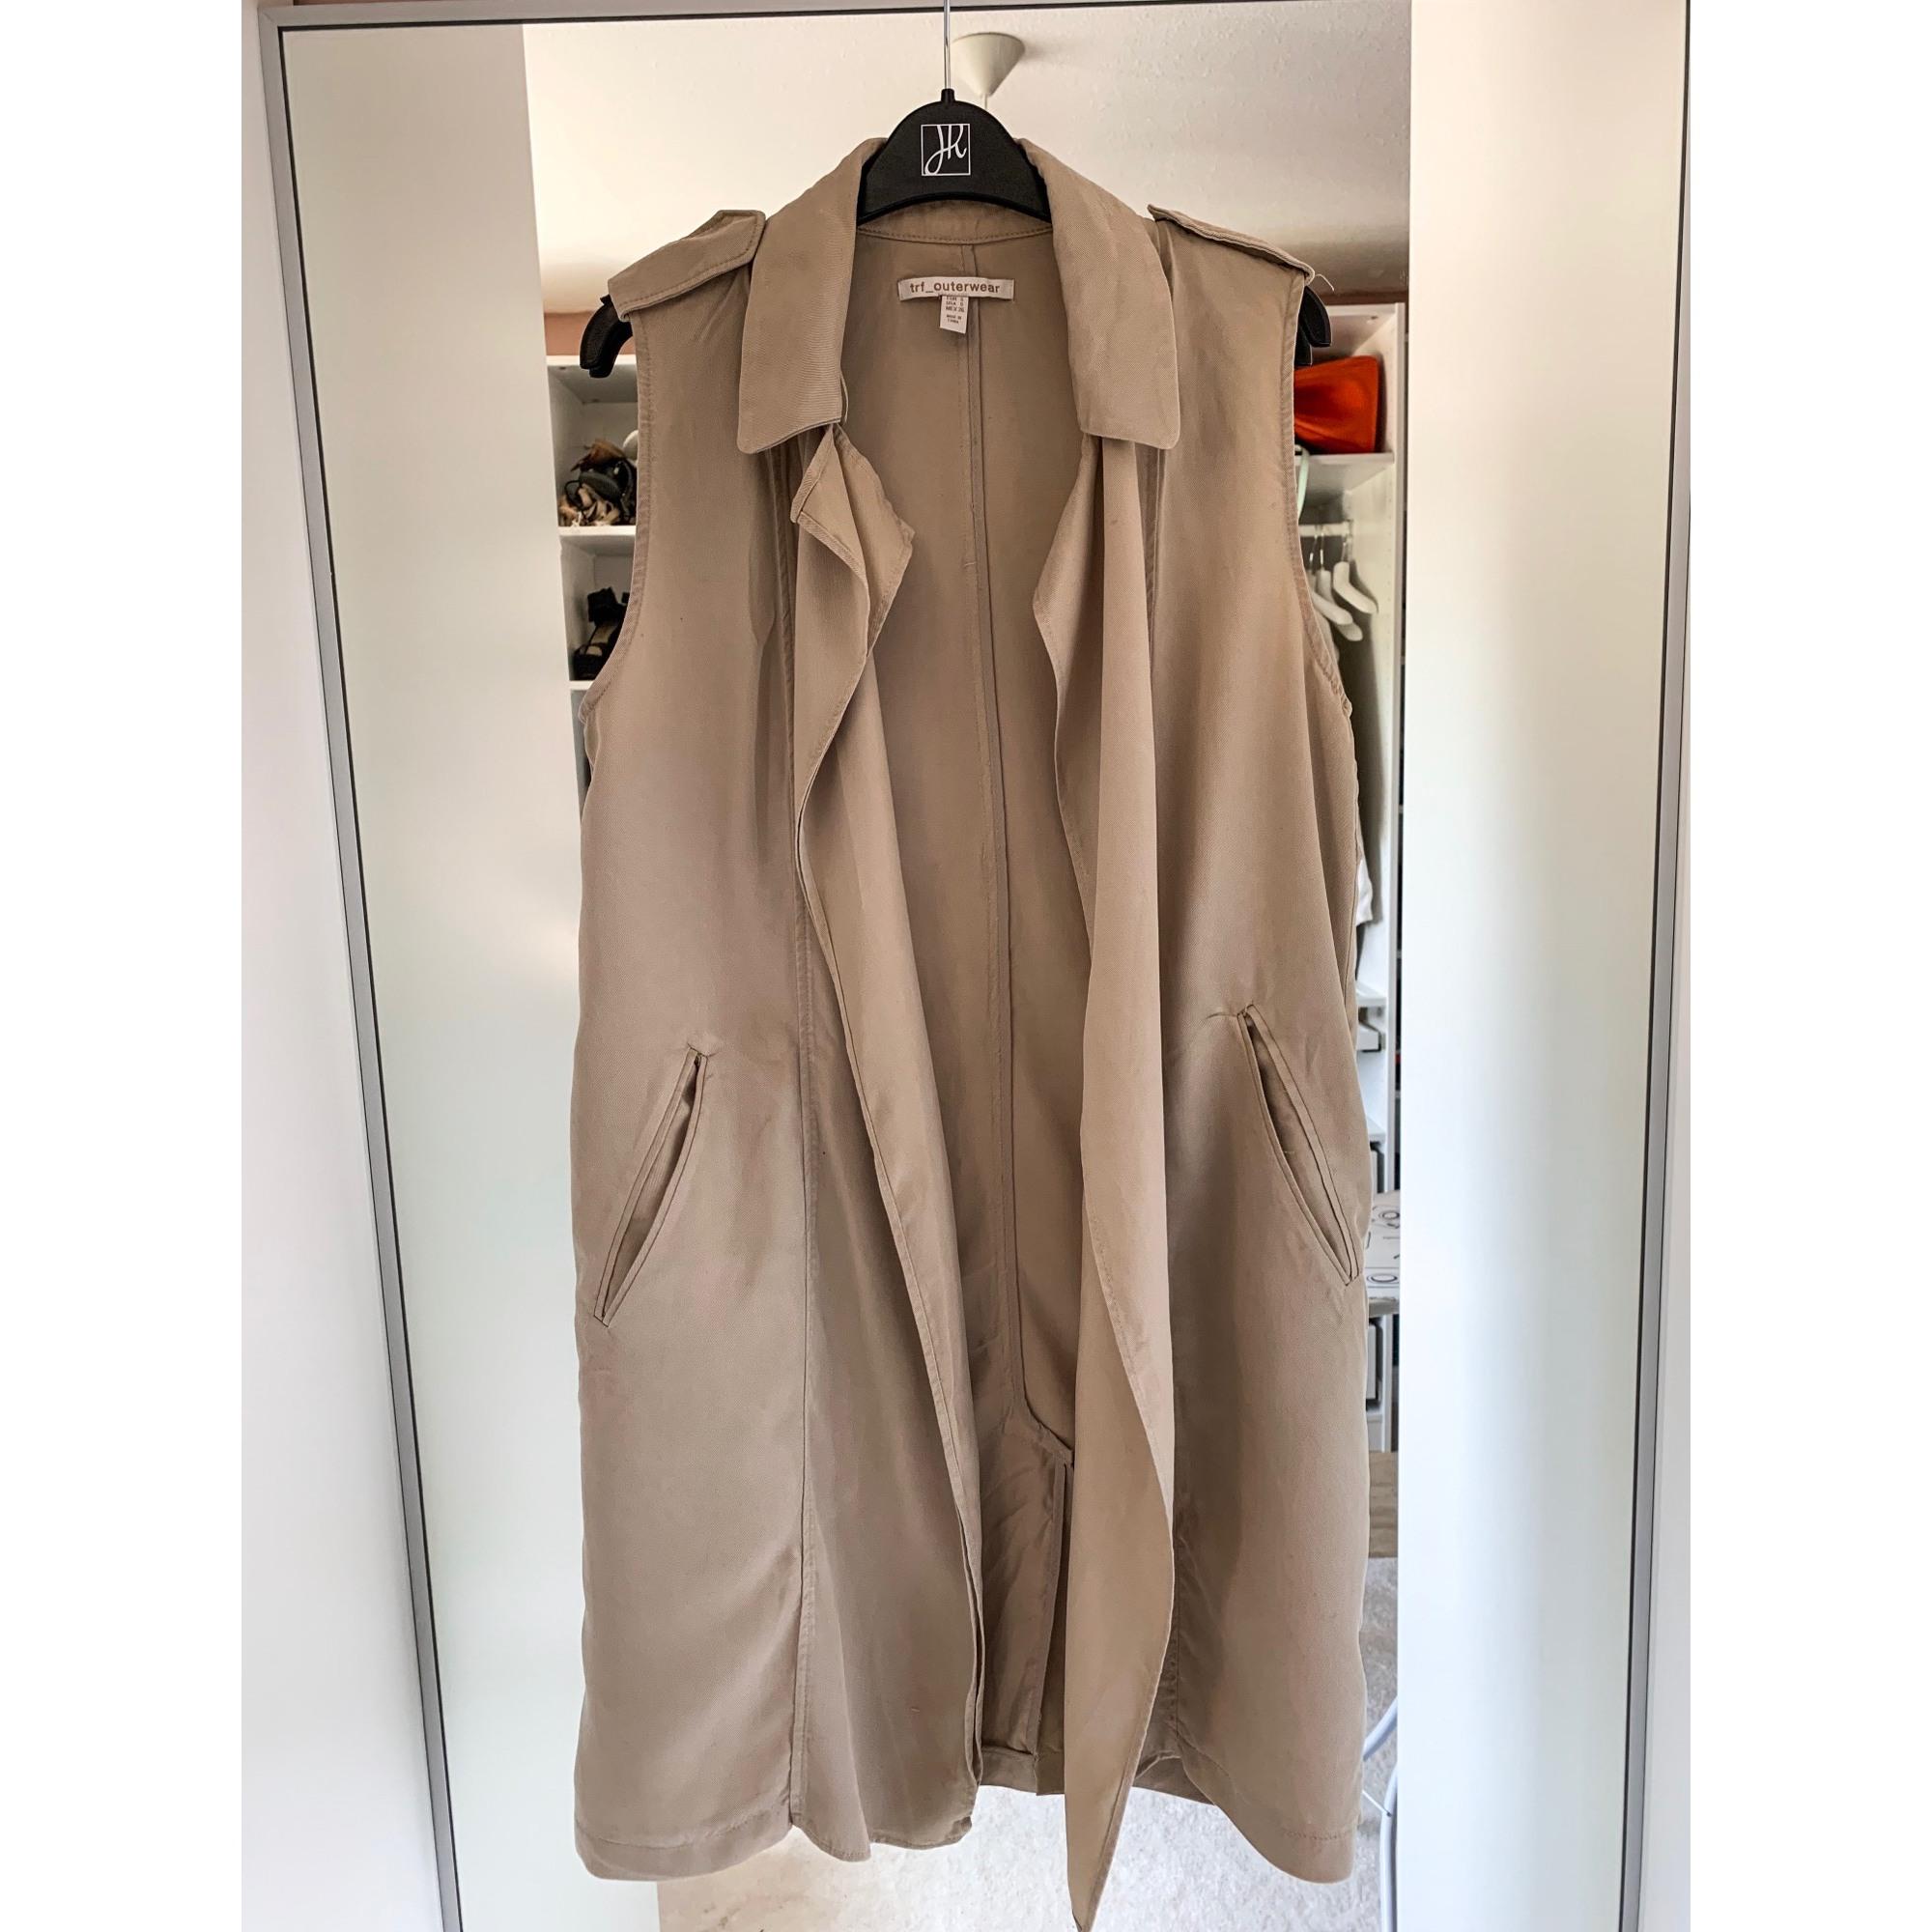 Jacket ZARA Beige, camel